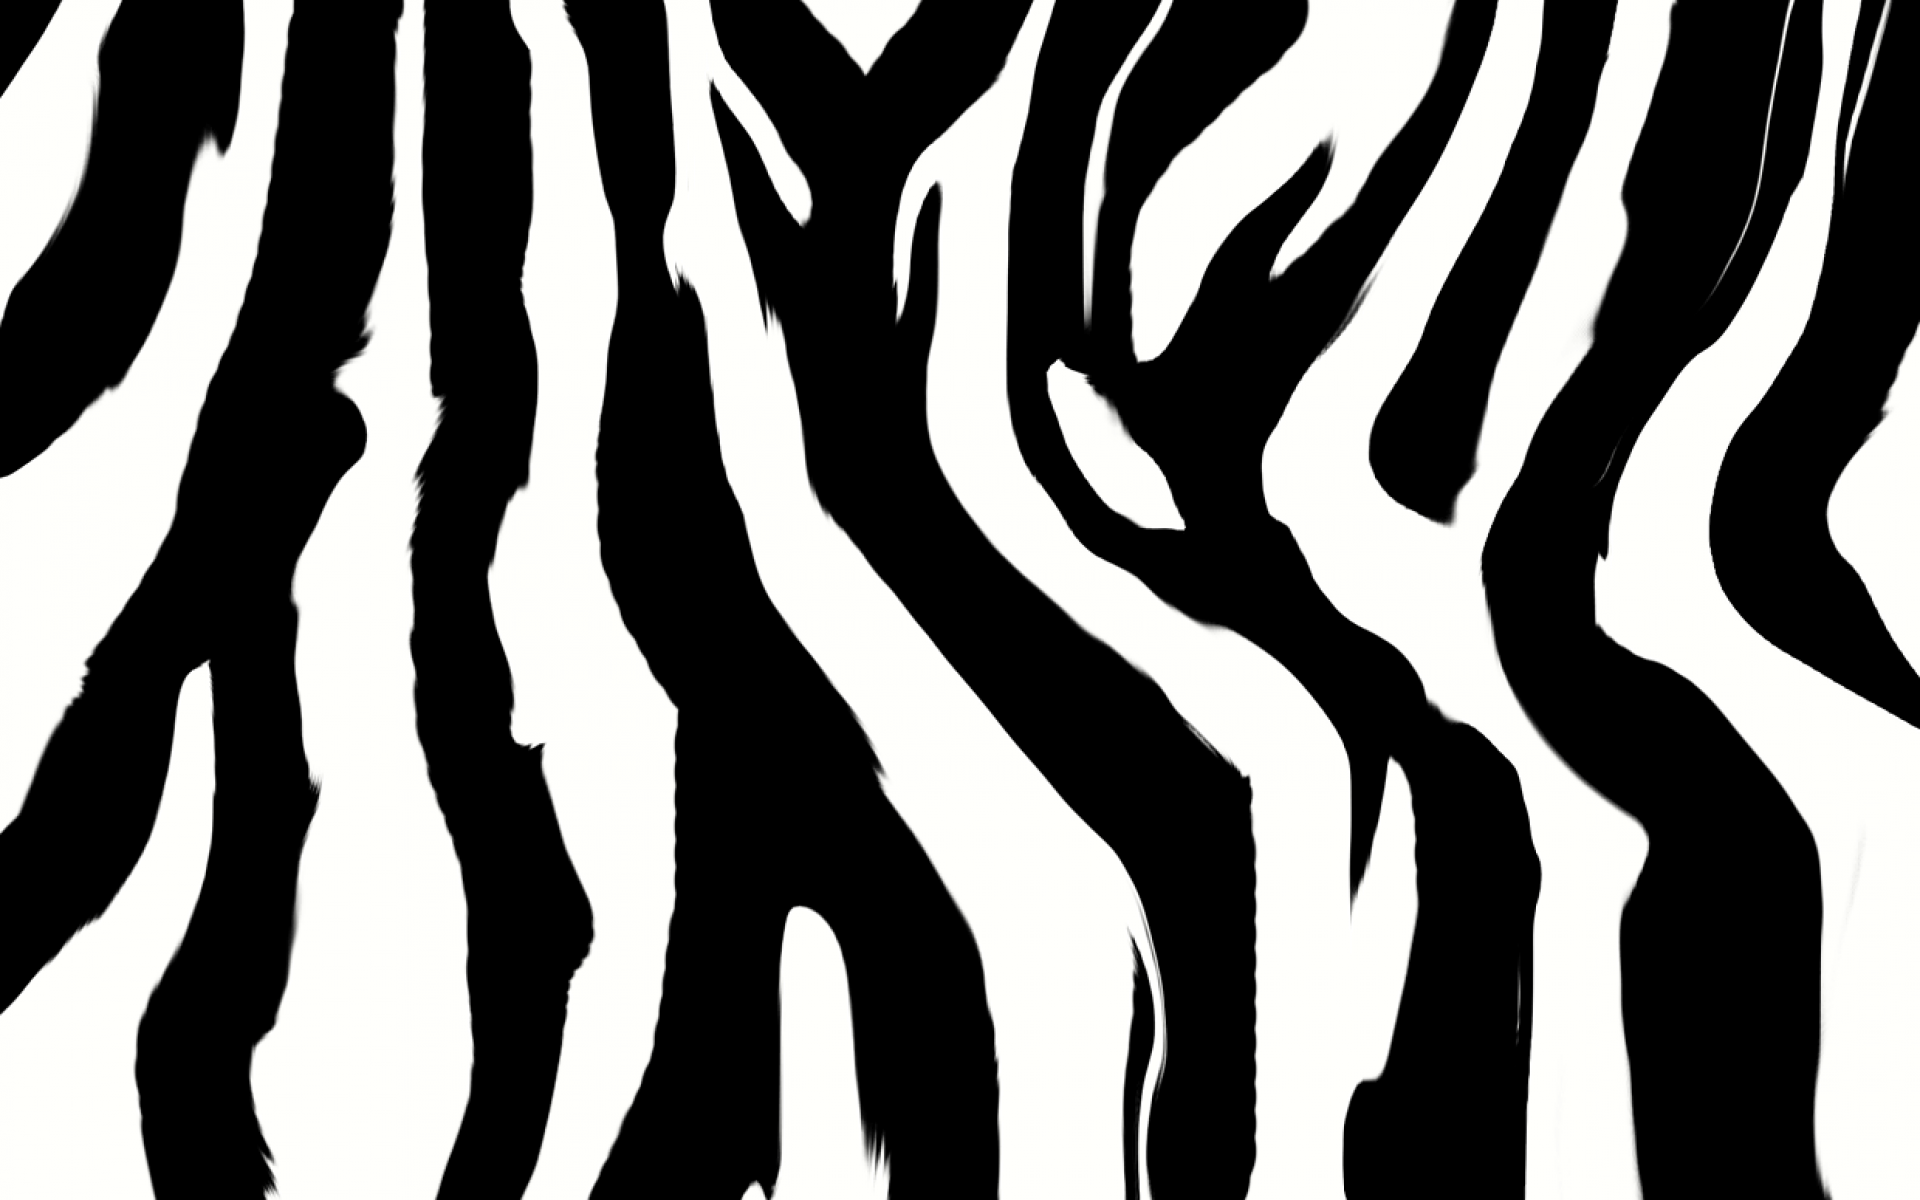 Zebra Print 804802 - Zebra Print PNG